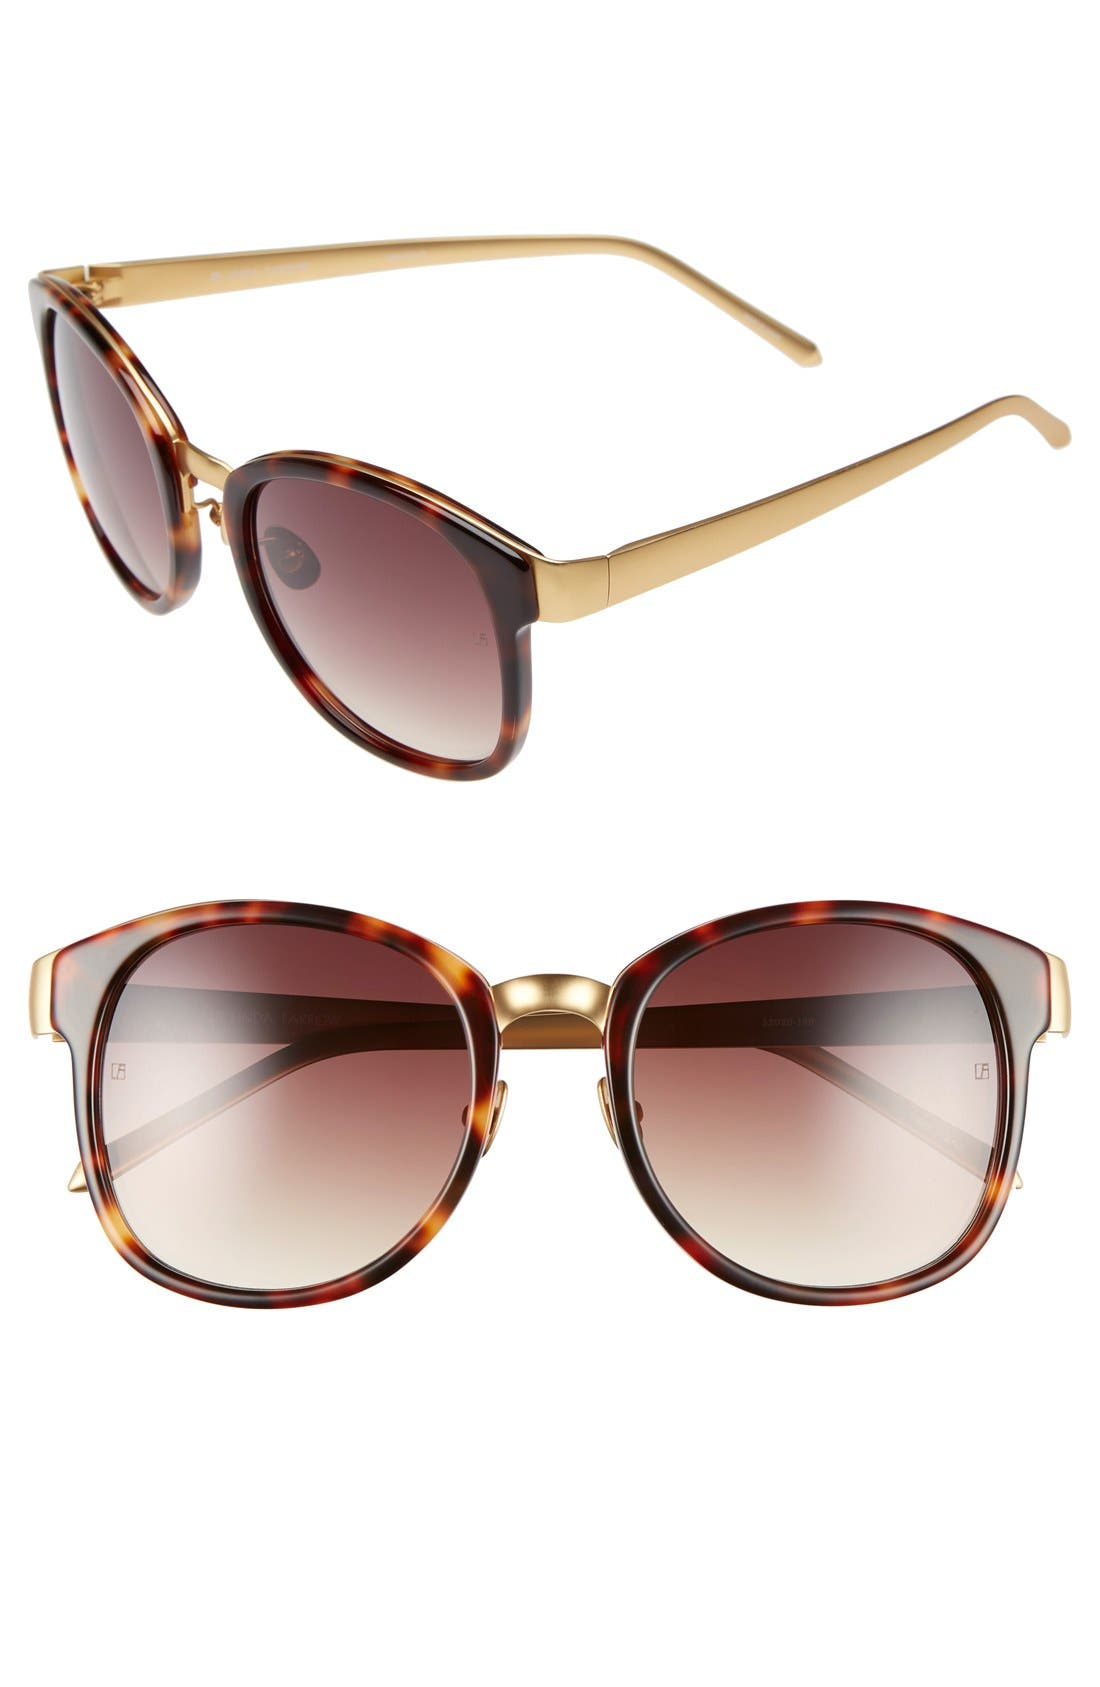 LINDA FARROW D-Frame 52mm 24 Karat Gold Trim Sunglasses